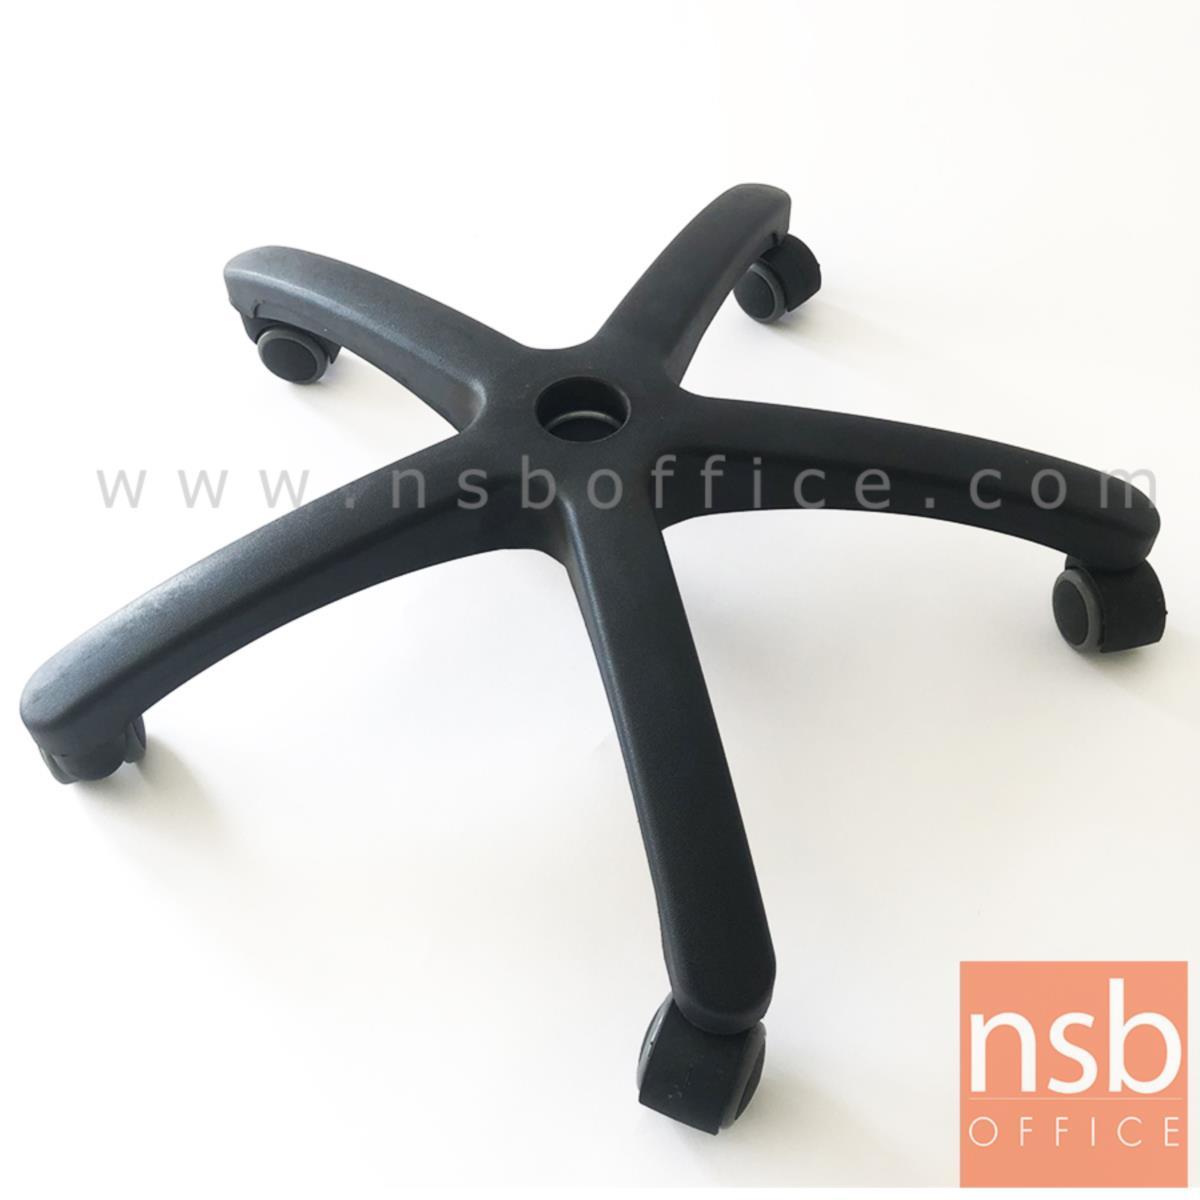 B27A051:ขาเก้าอี้สำนักงานพลาสติกเนื้อเหนียว PA   พร้อมล้อ PU ขอบเทา